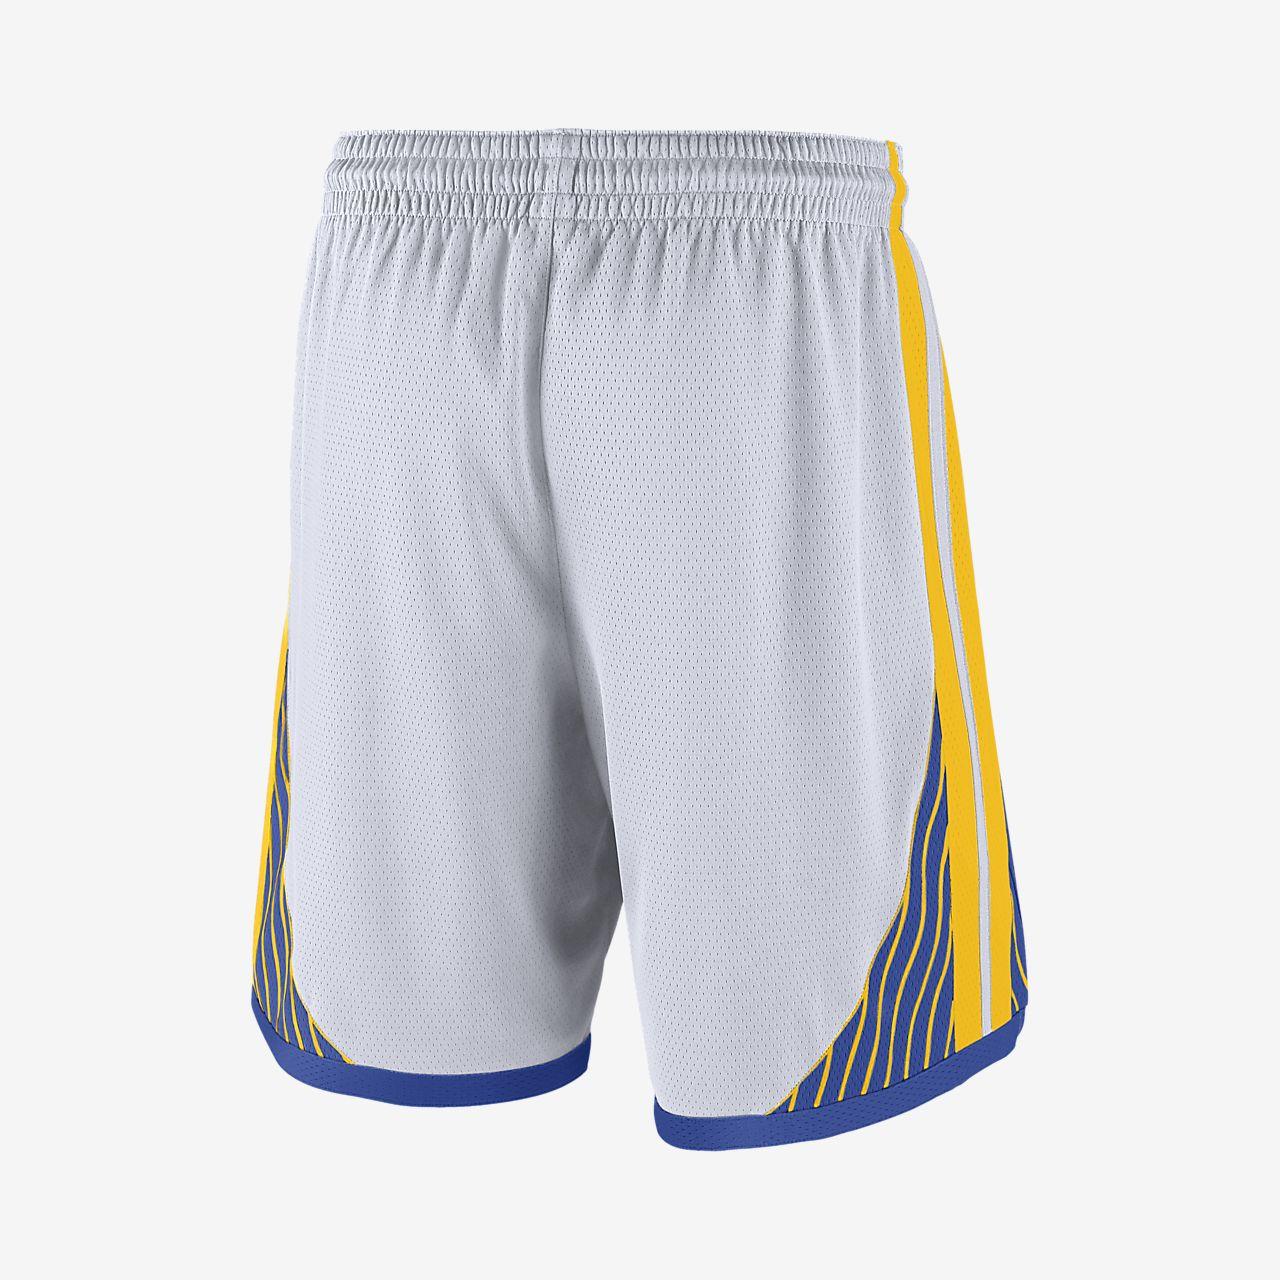 ... Golden State Warriors Nike Association Edition Swingman Men's NBA Shorts